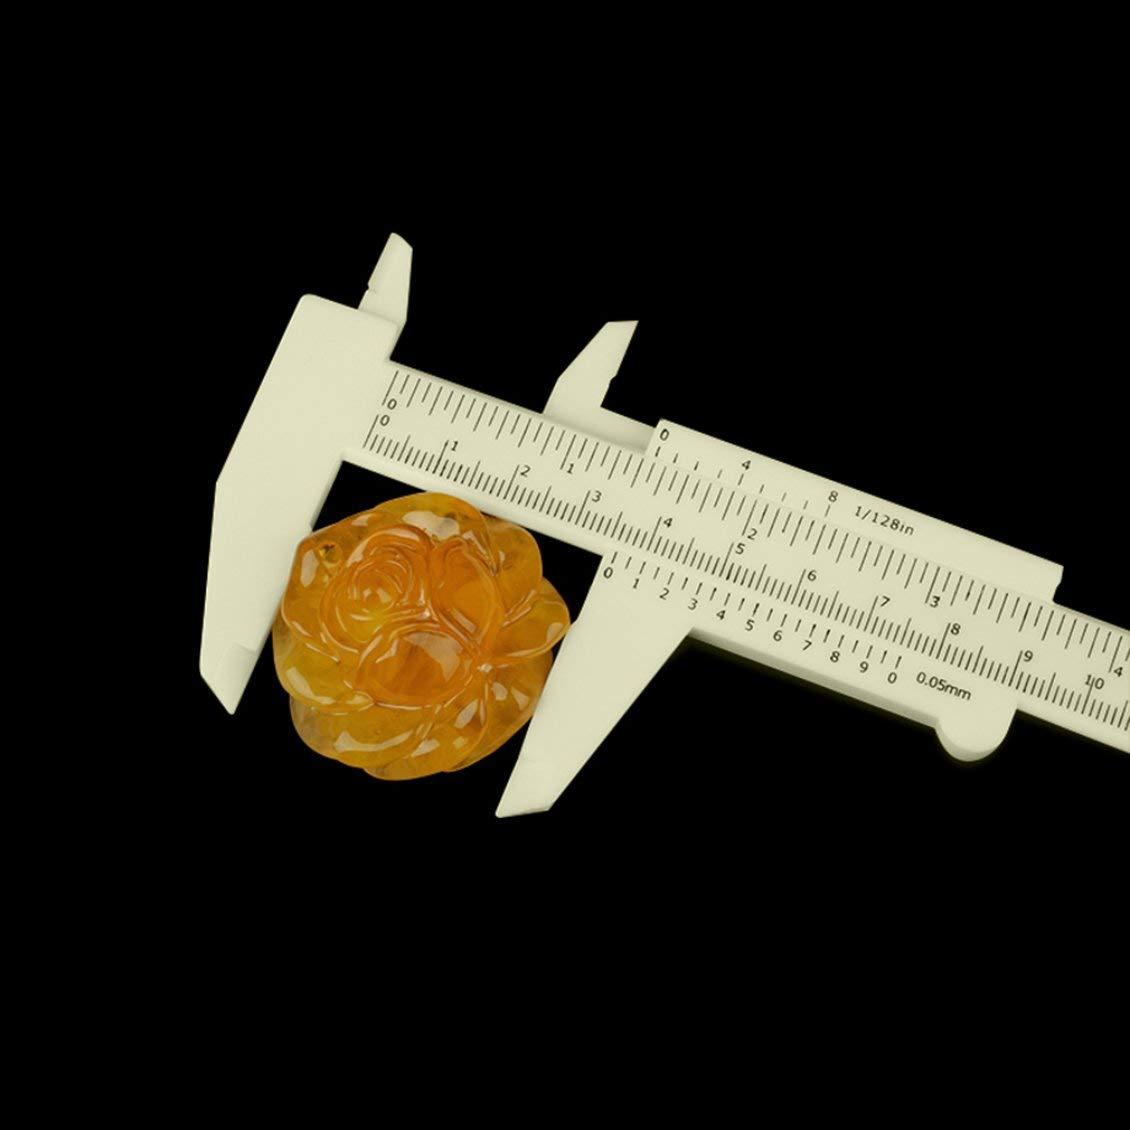 0 a 150 mm 6 pulgadas mini pl/ástico deslizante Vernier calibrador calibrador herramienta de medici/ón hogar al aire libre usado mini regla port/átil